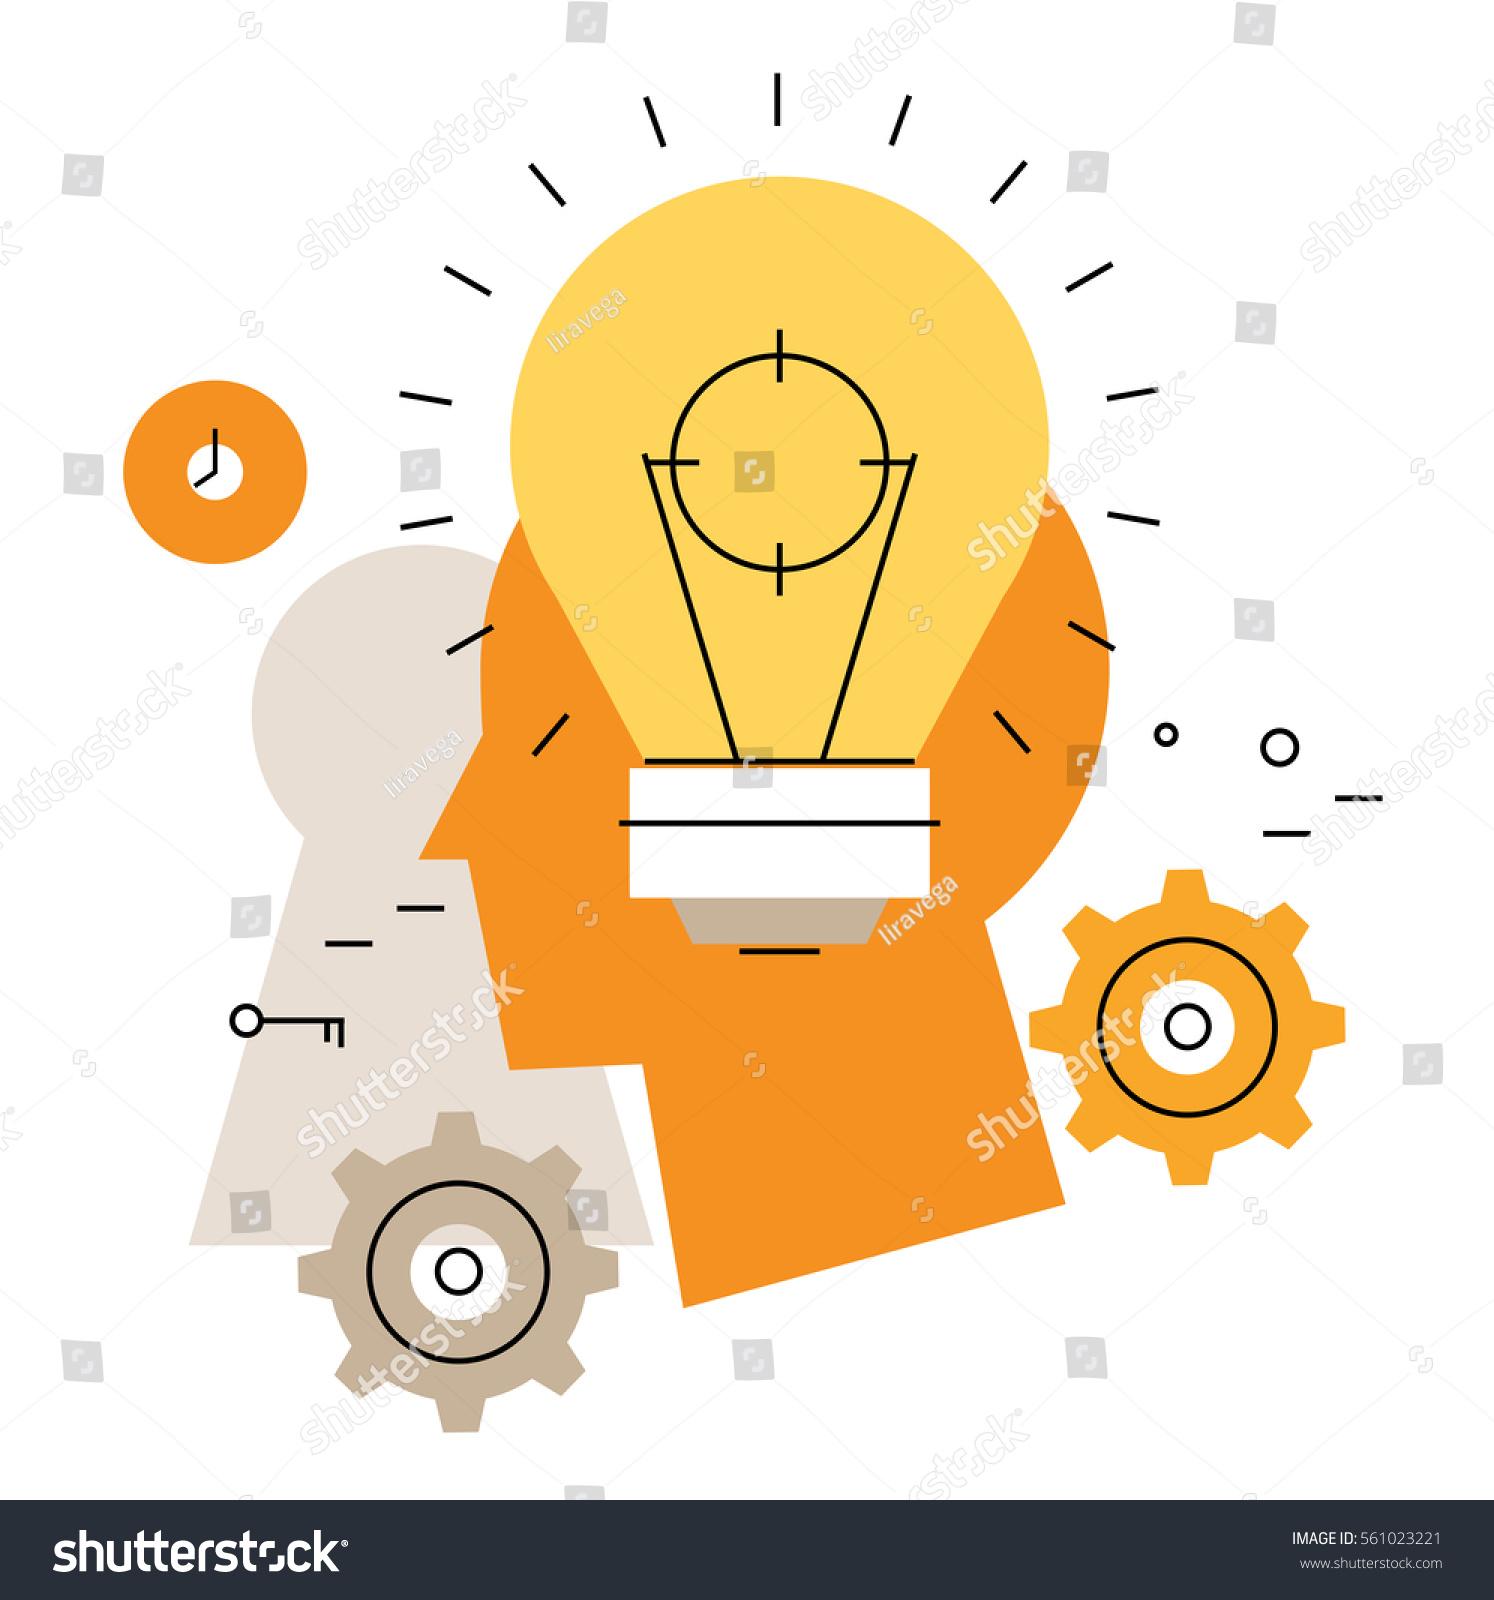 Brainstorming Flat Line Business Vector Illustration Stock